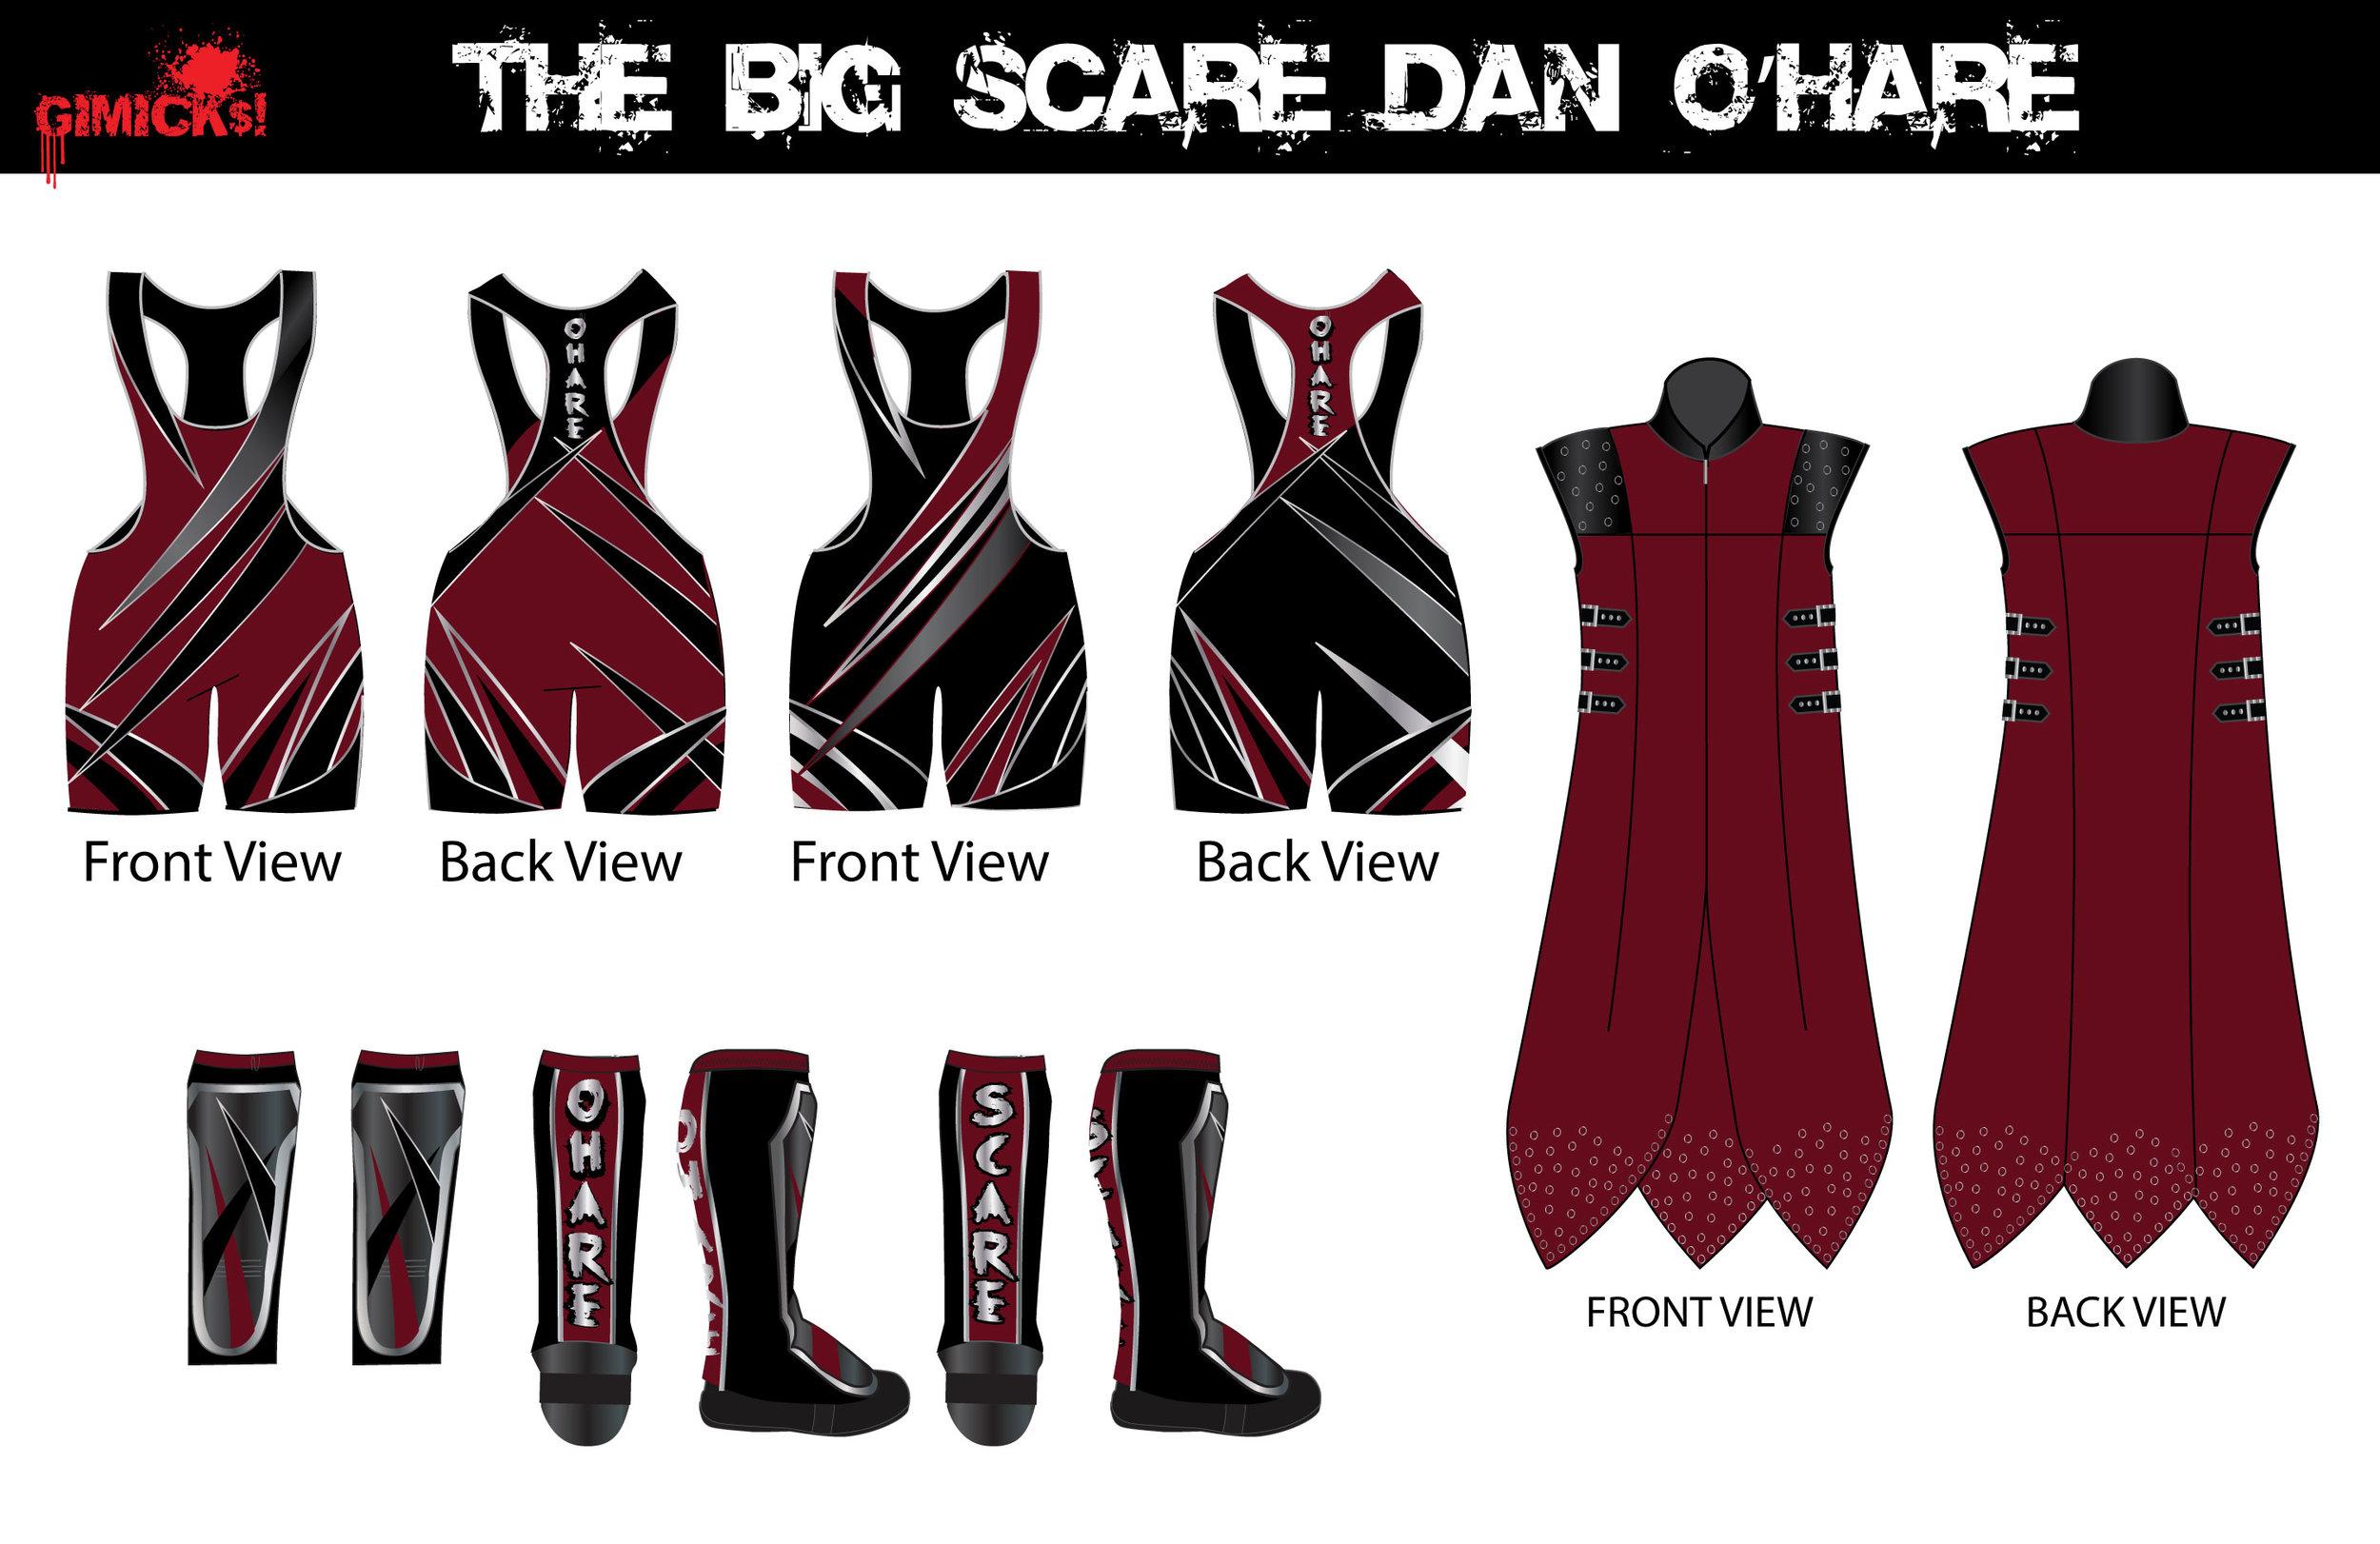 DanOhara-New-Gear-Design-FINAL-Option2B.jpg